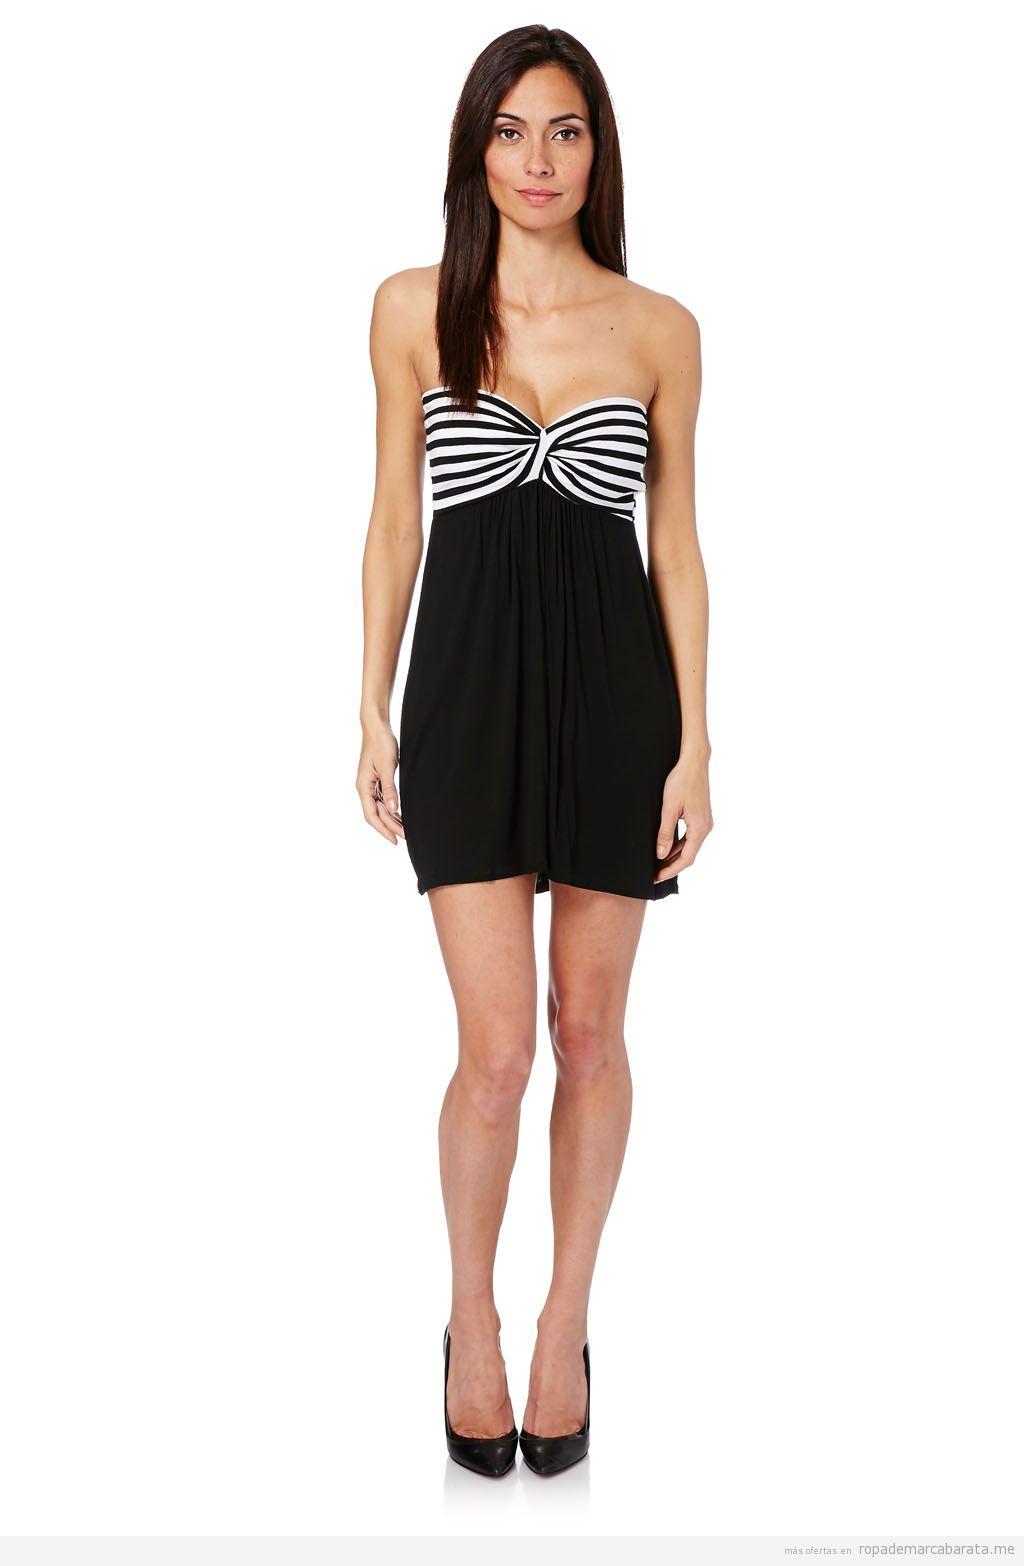 Vestidos verano marca Milles Barcelona baratos, outlet online 3